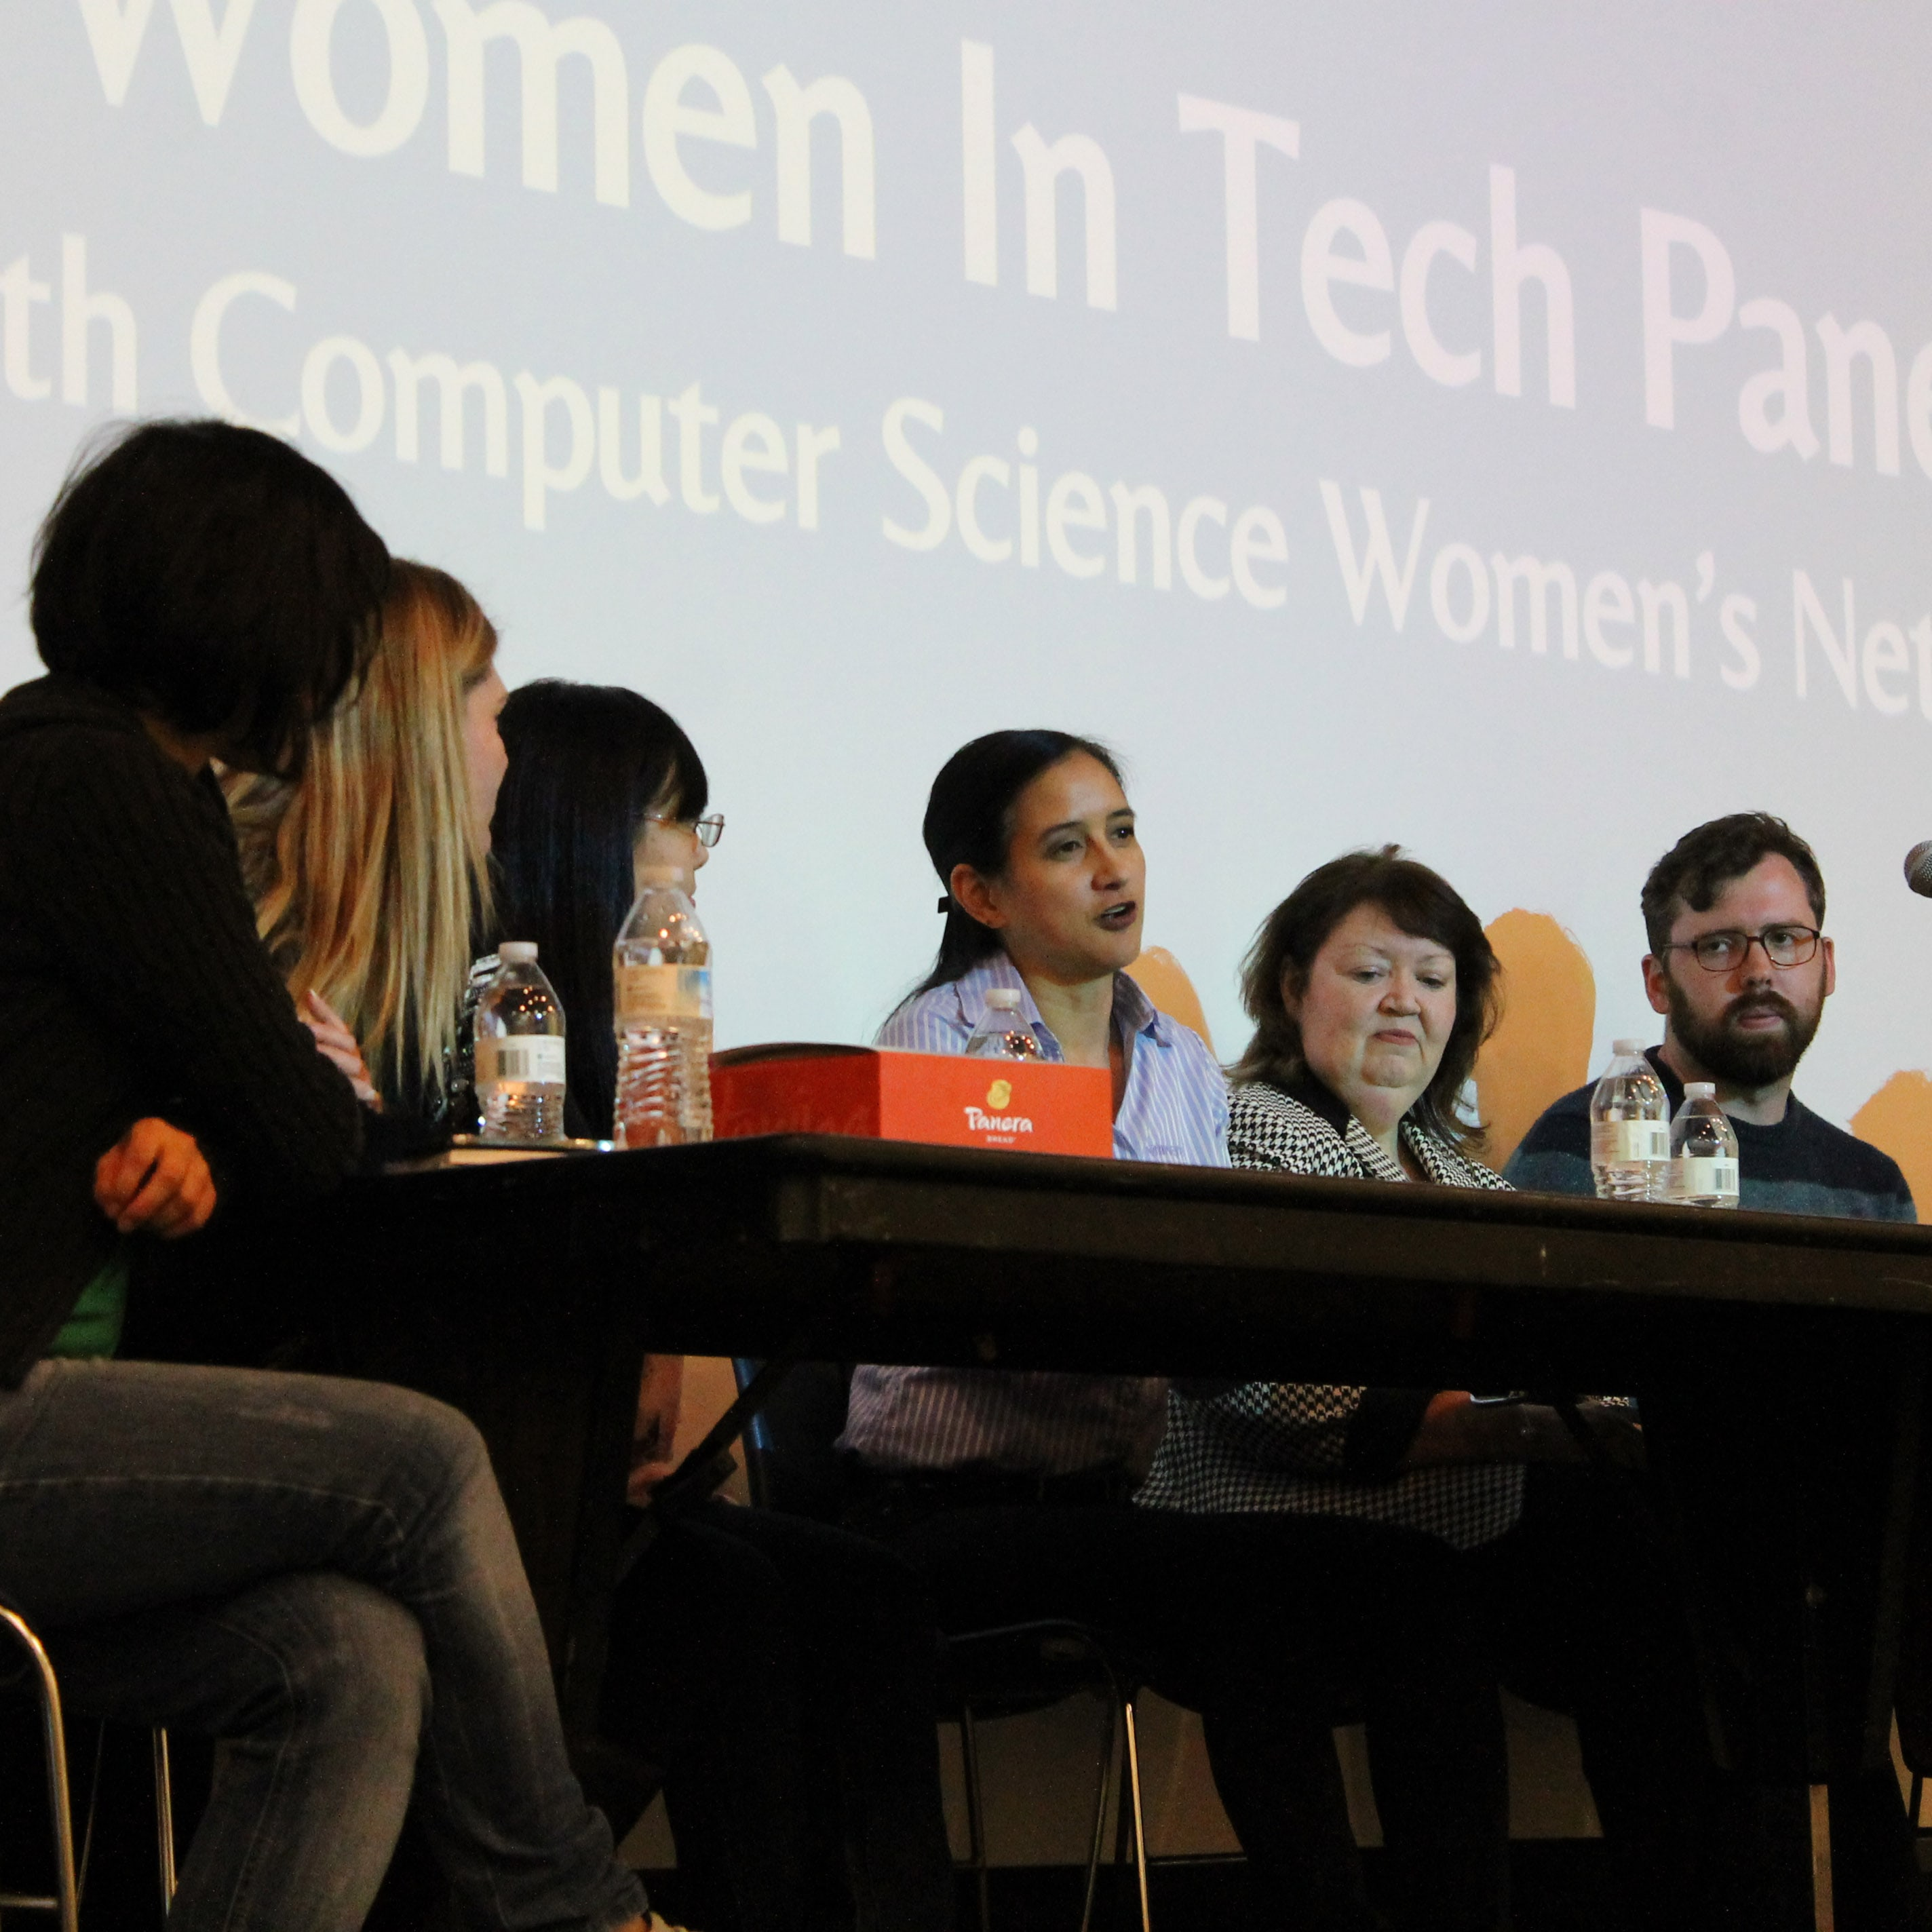 computer science women s network women in tech panel